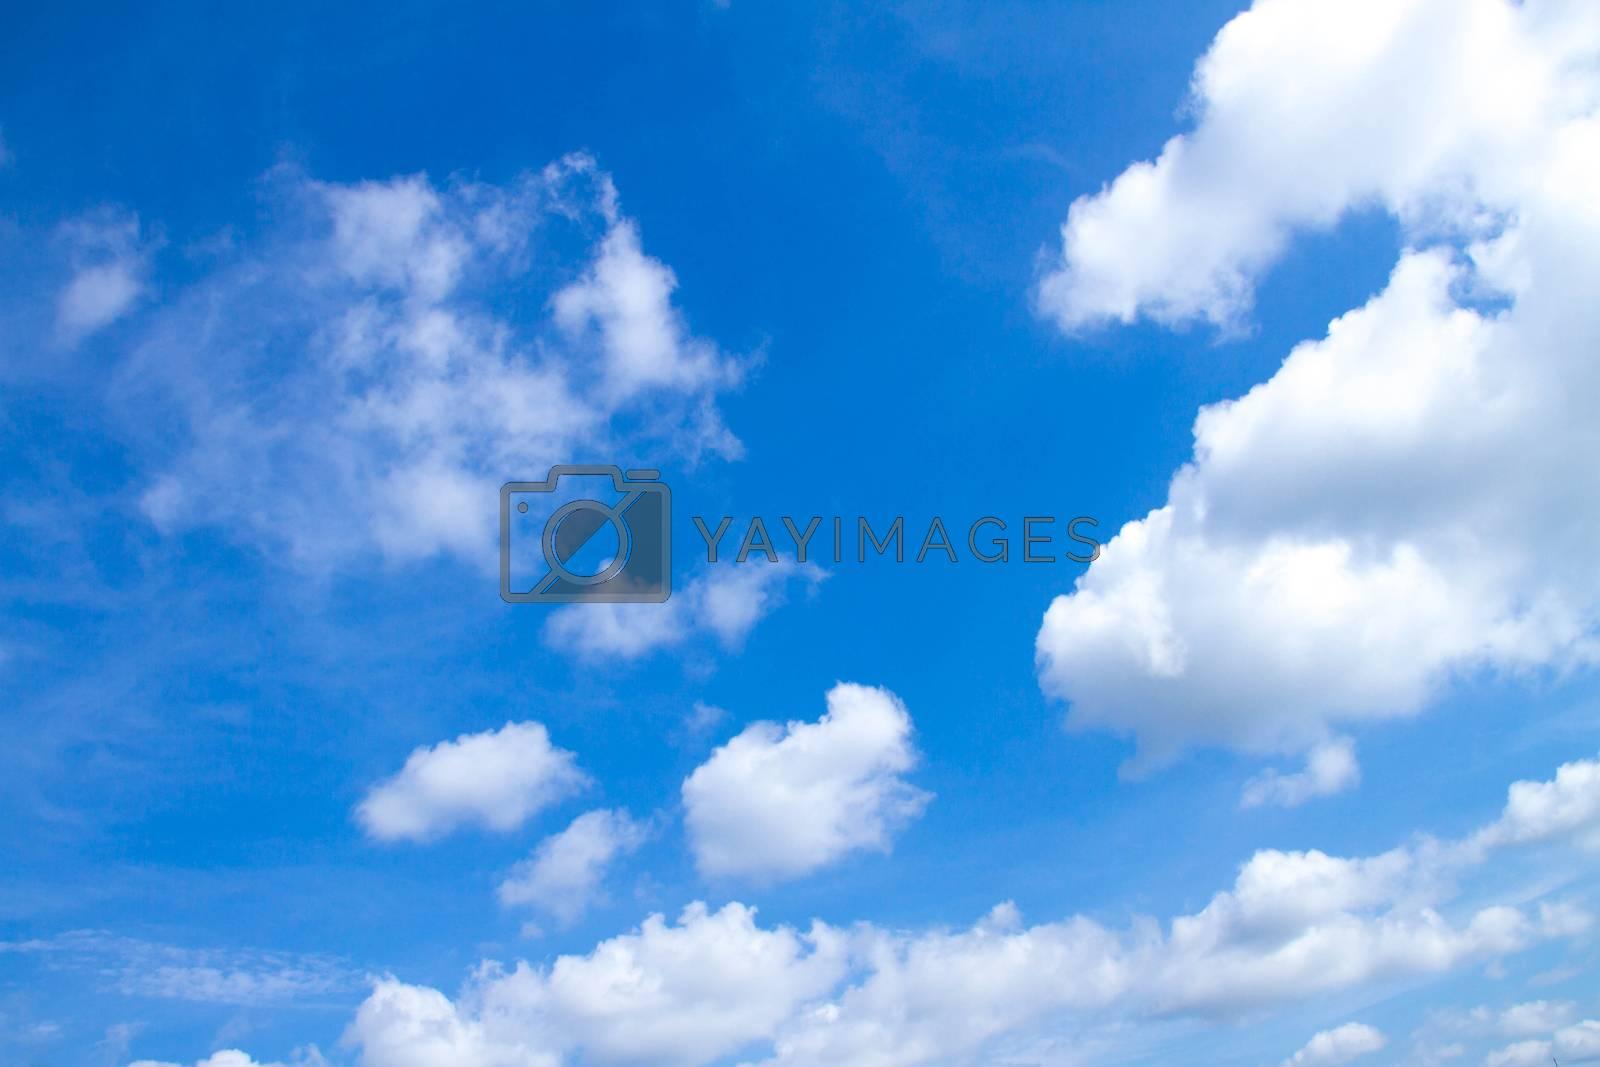 blue sky by jee1999